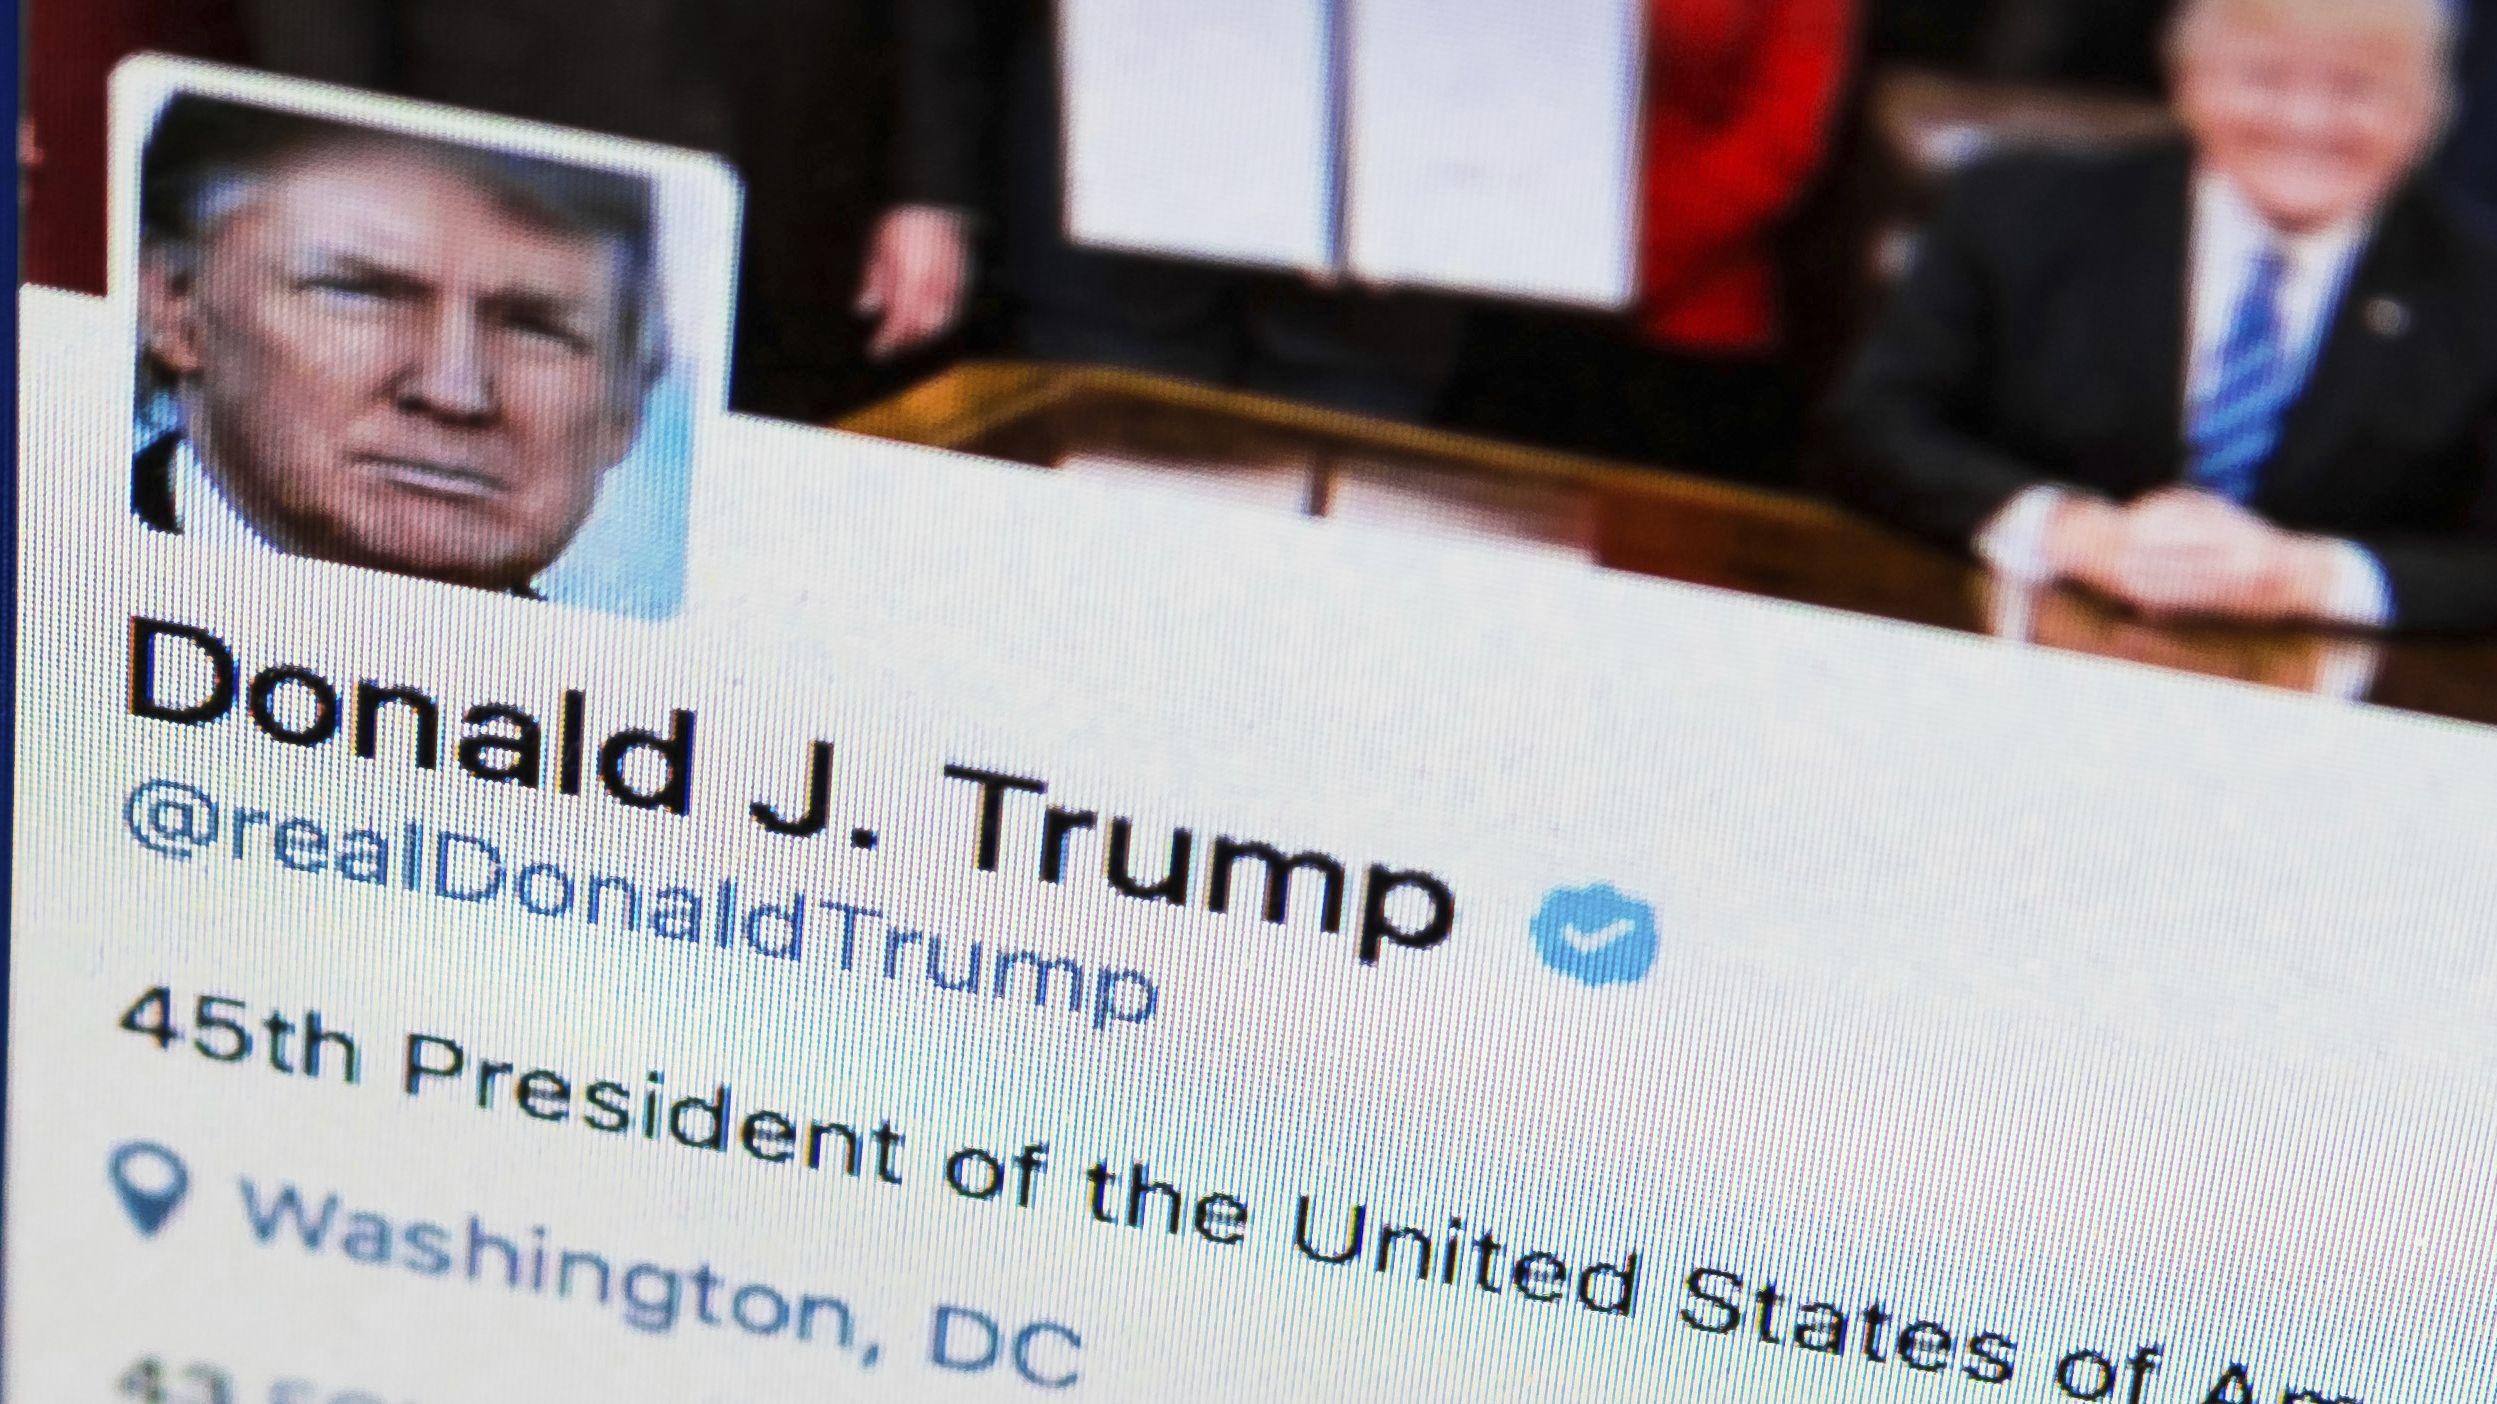 Twitteraccount des Präsidenten